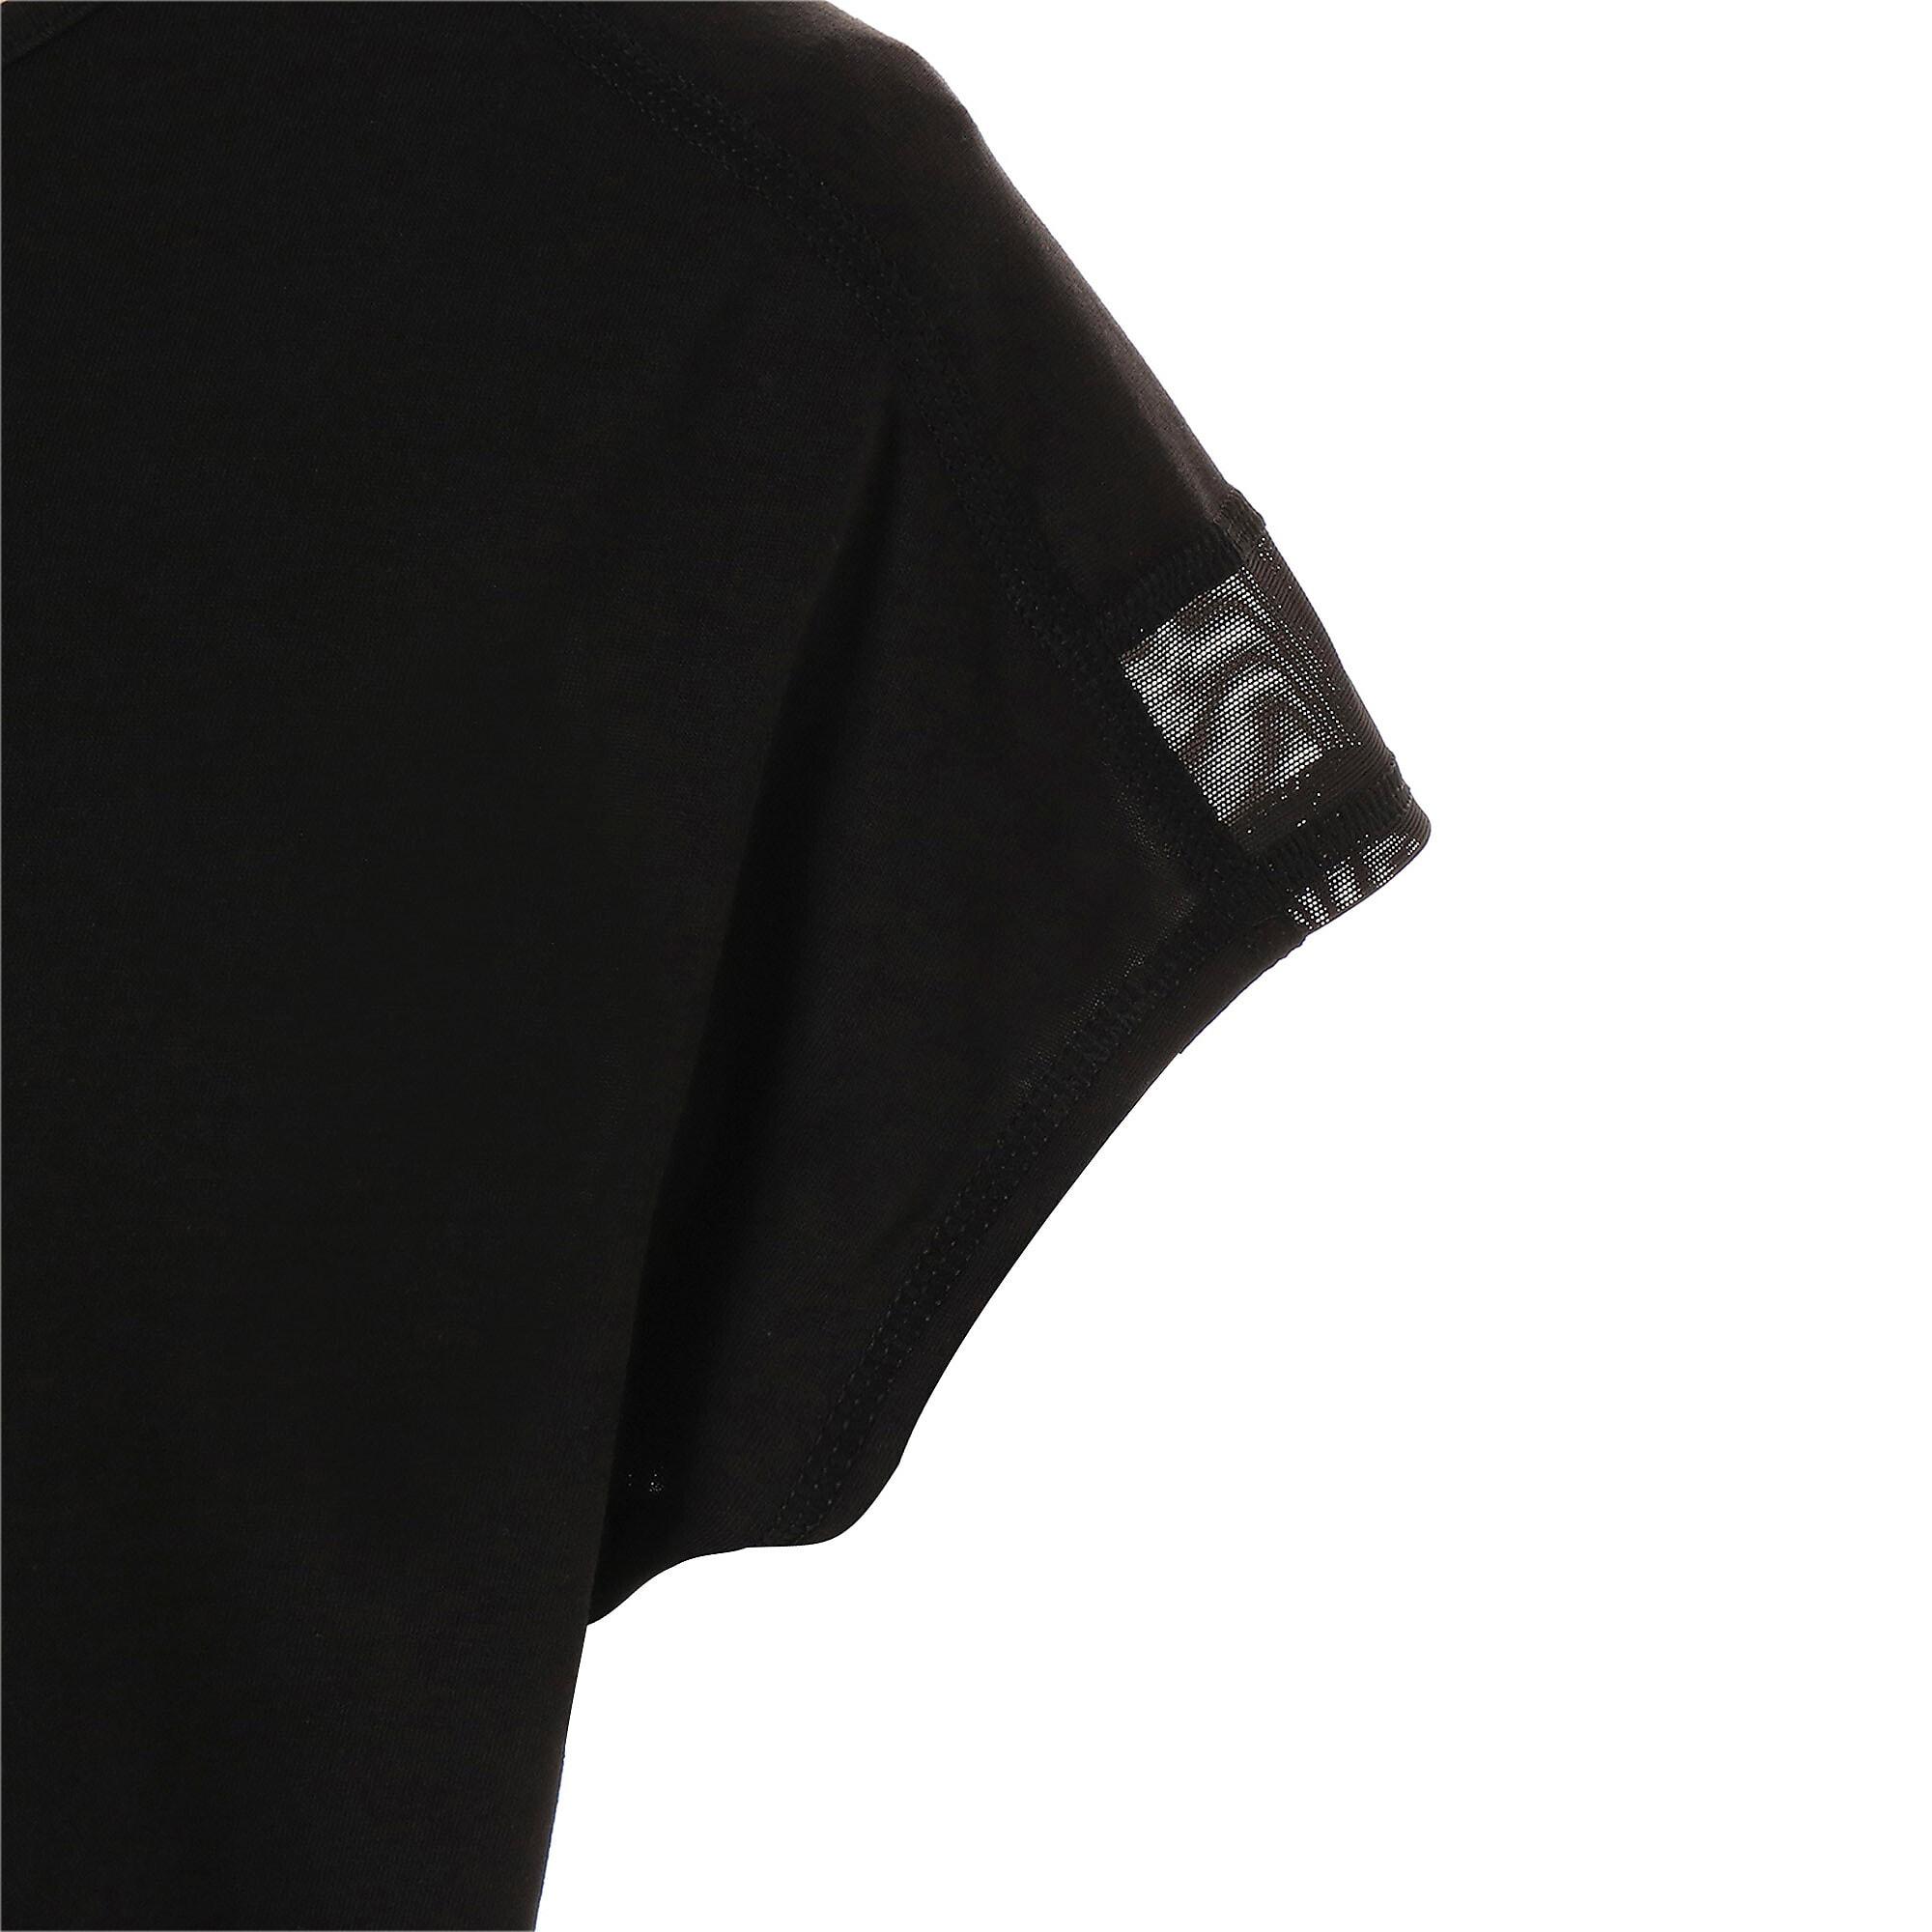 Thumbnail 8 of スタジオ SS ウィメンズ トレーニング メッシュ キャット Tシャツ 半袖, Puma Black-Yellow Alert, medium-JPN